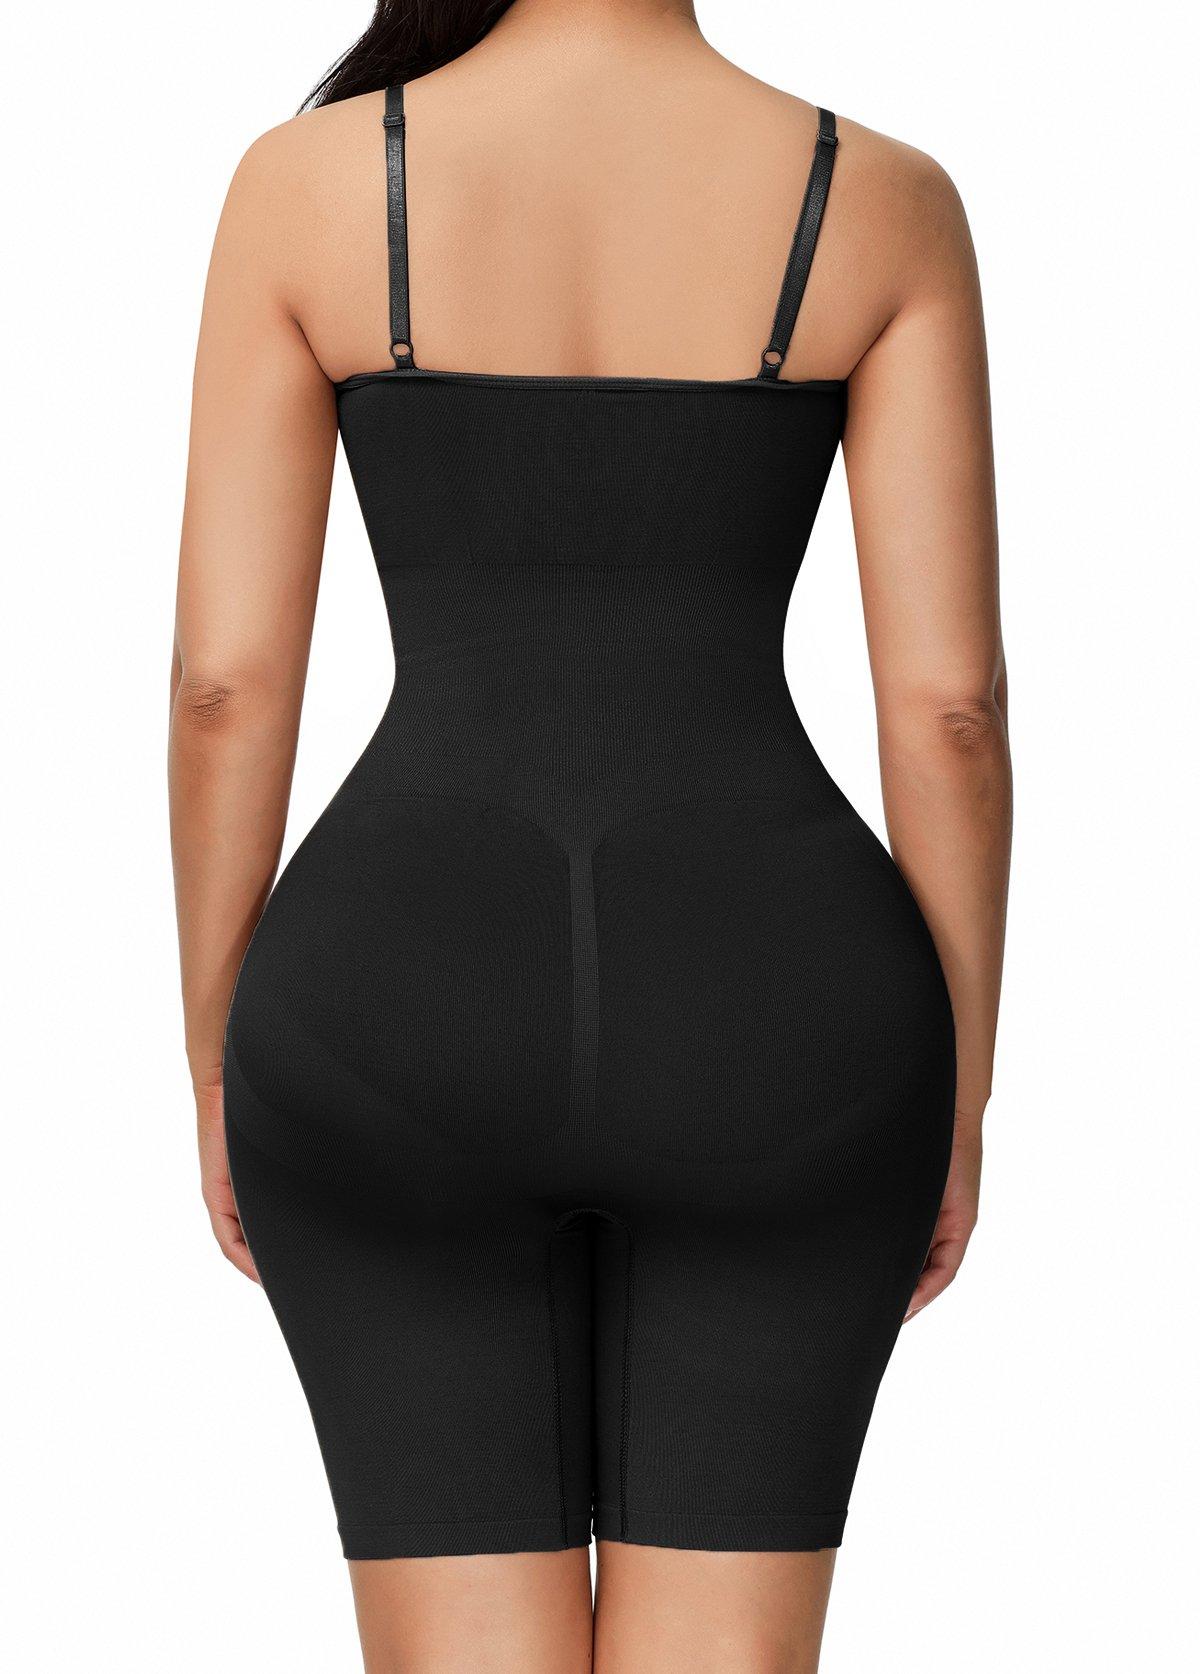 Spaghetti Strap Black Shapewear for Women